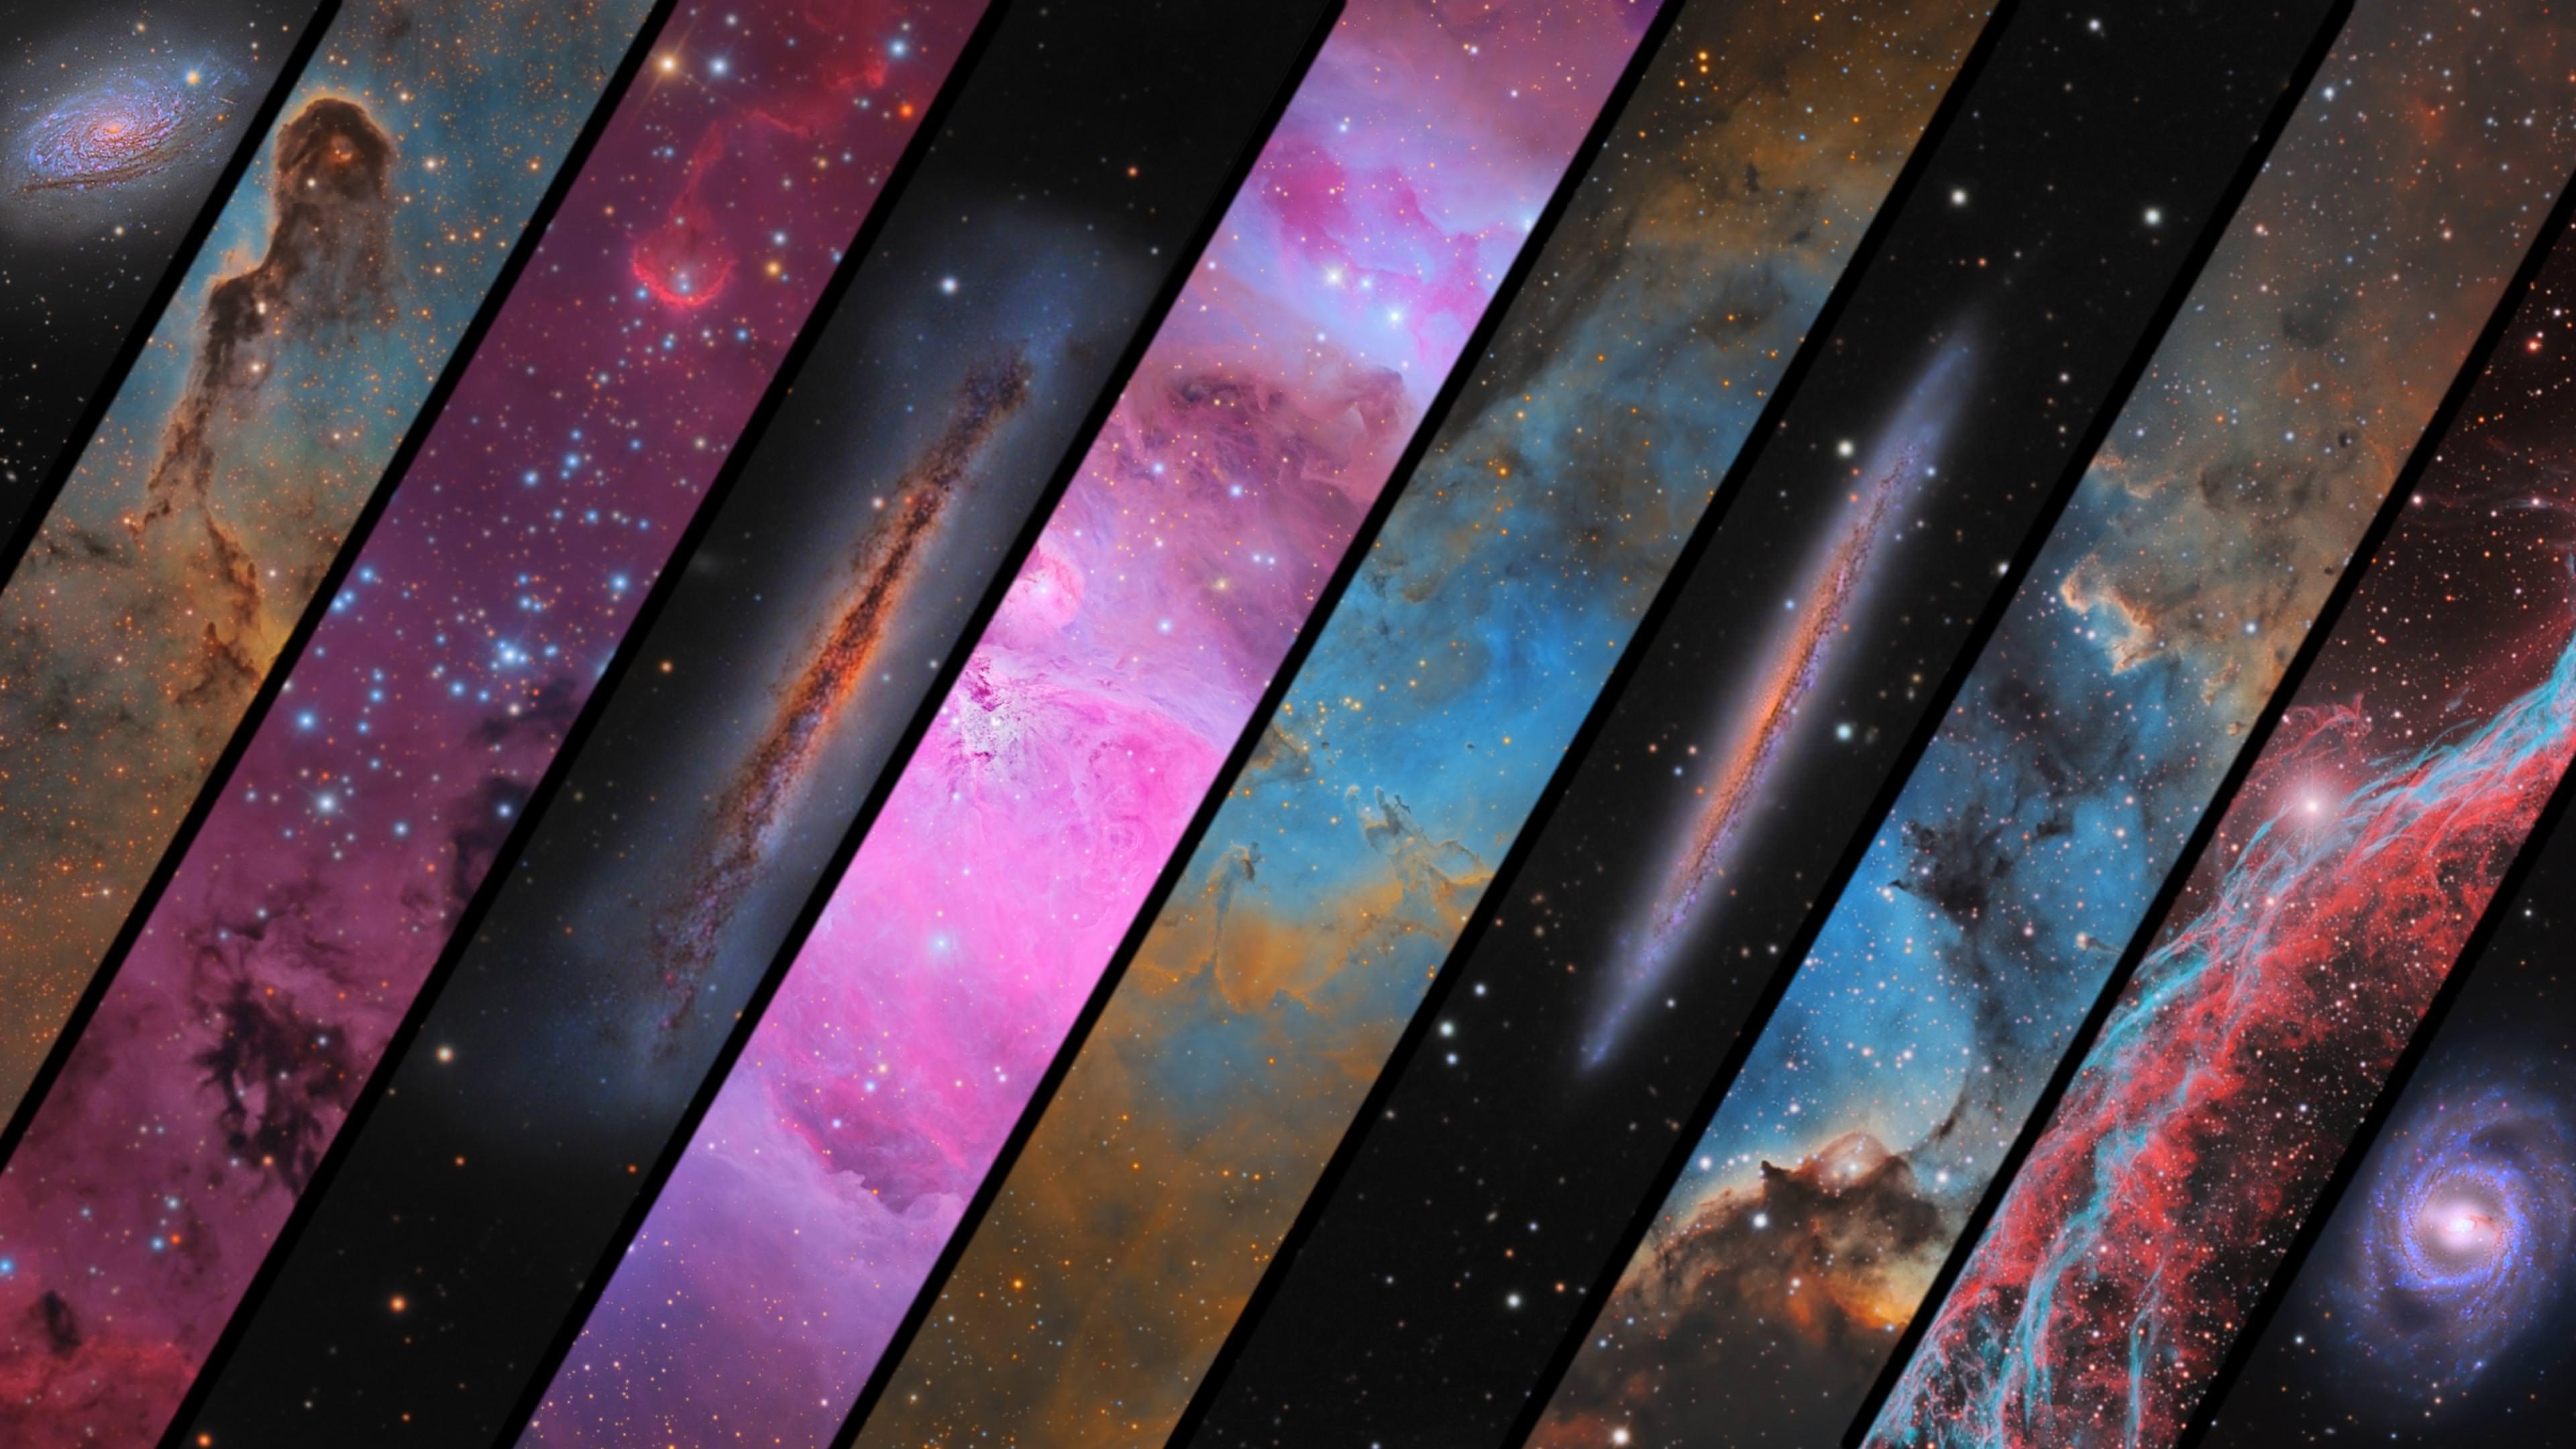 The cosmos 4k wallpaper - Space 4k phone wallpaper ...